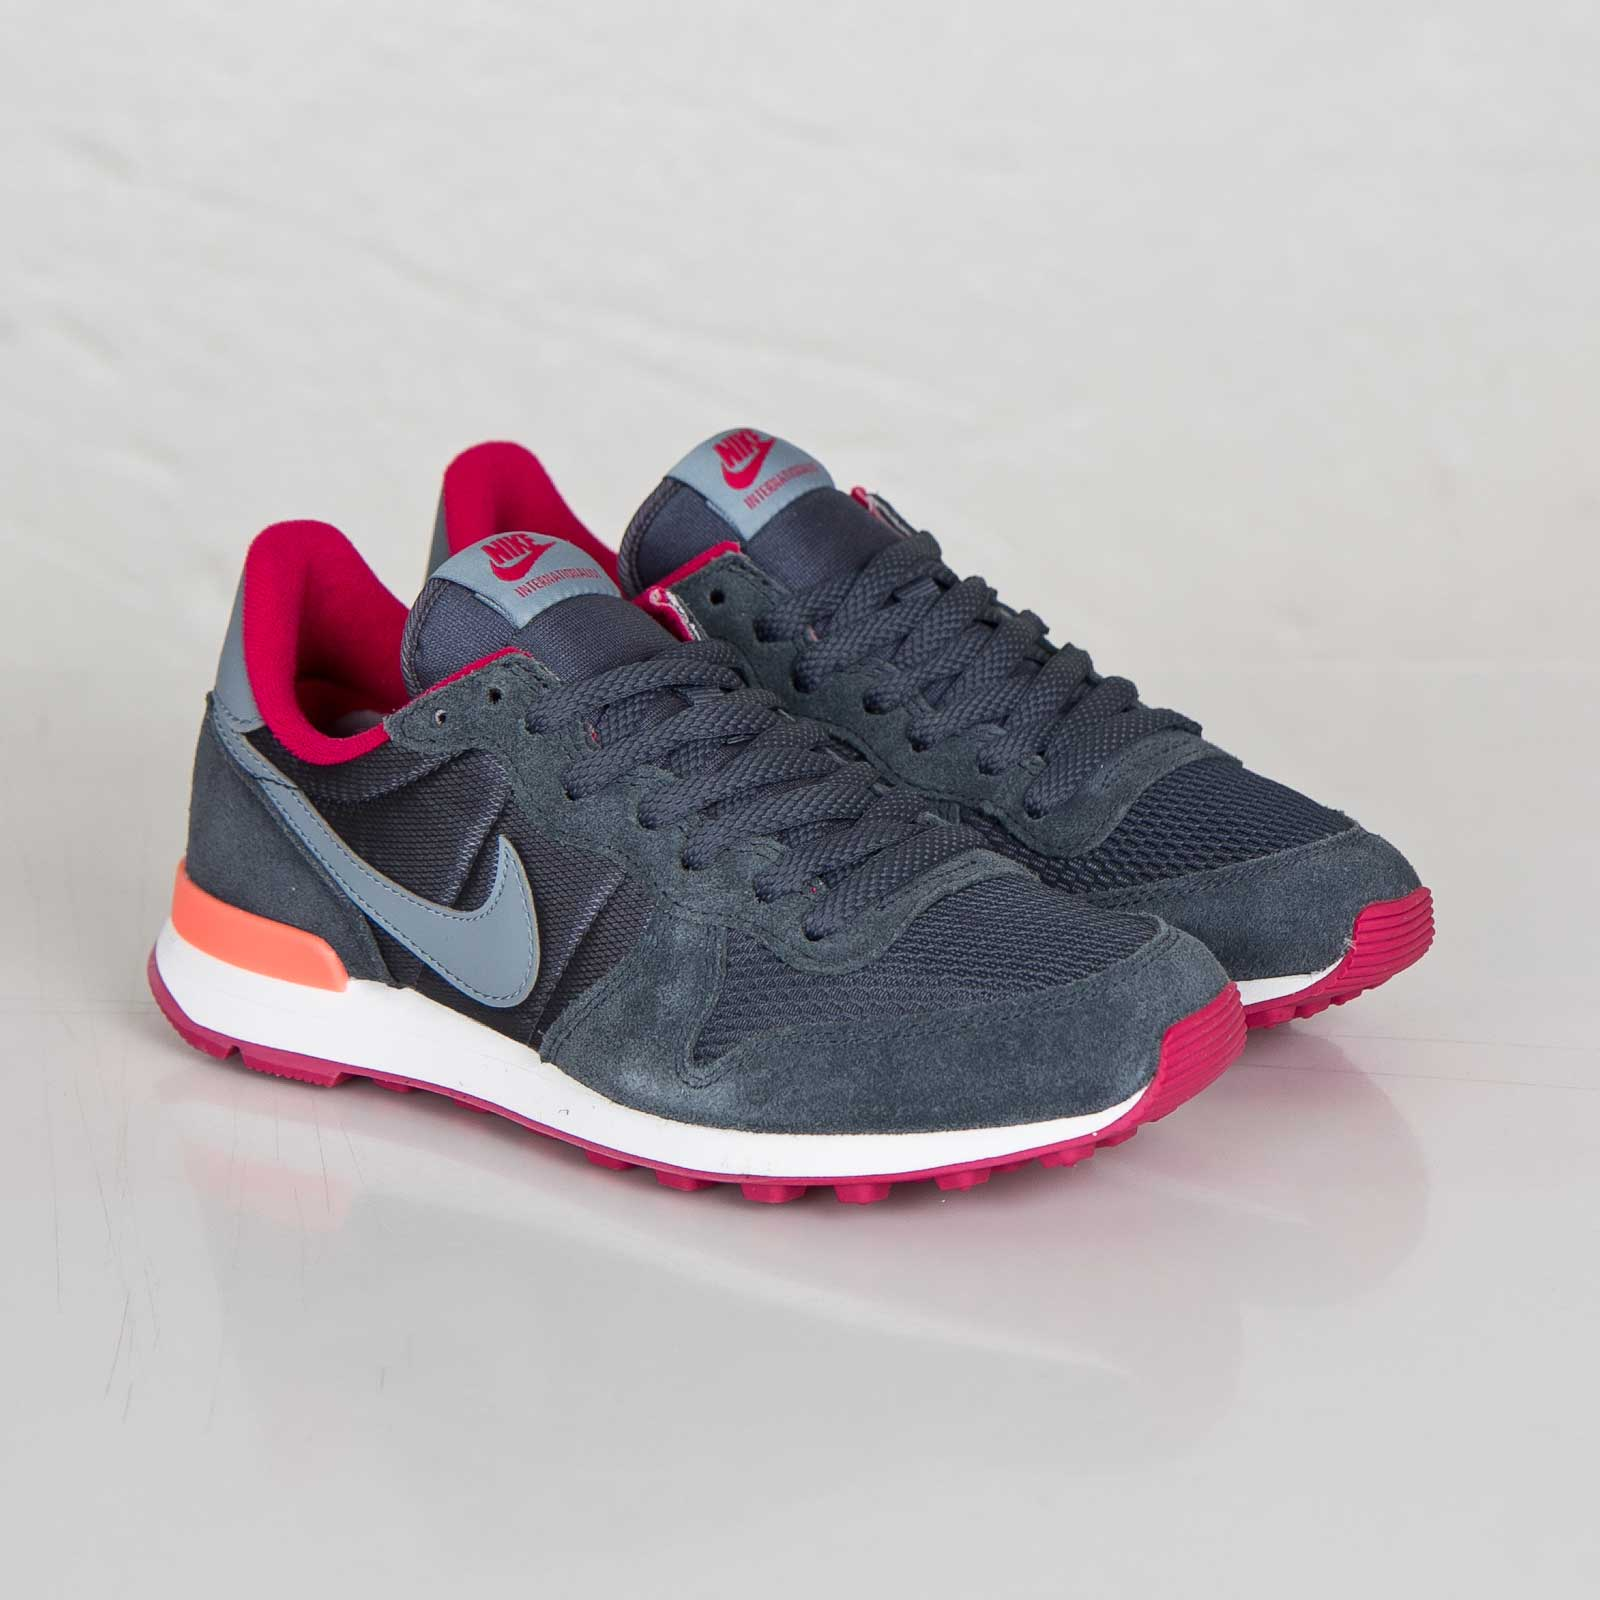 official photos 25a07 0da6e Nike Wmns Internationalist